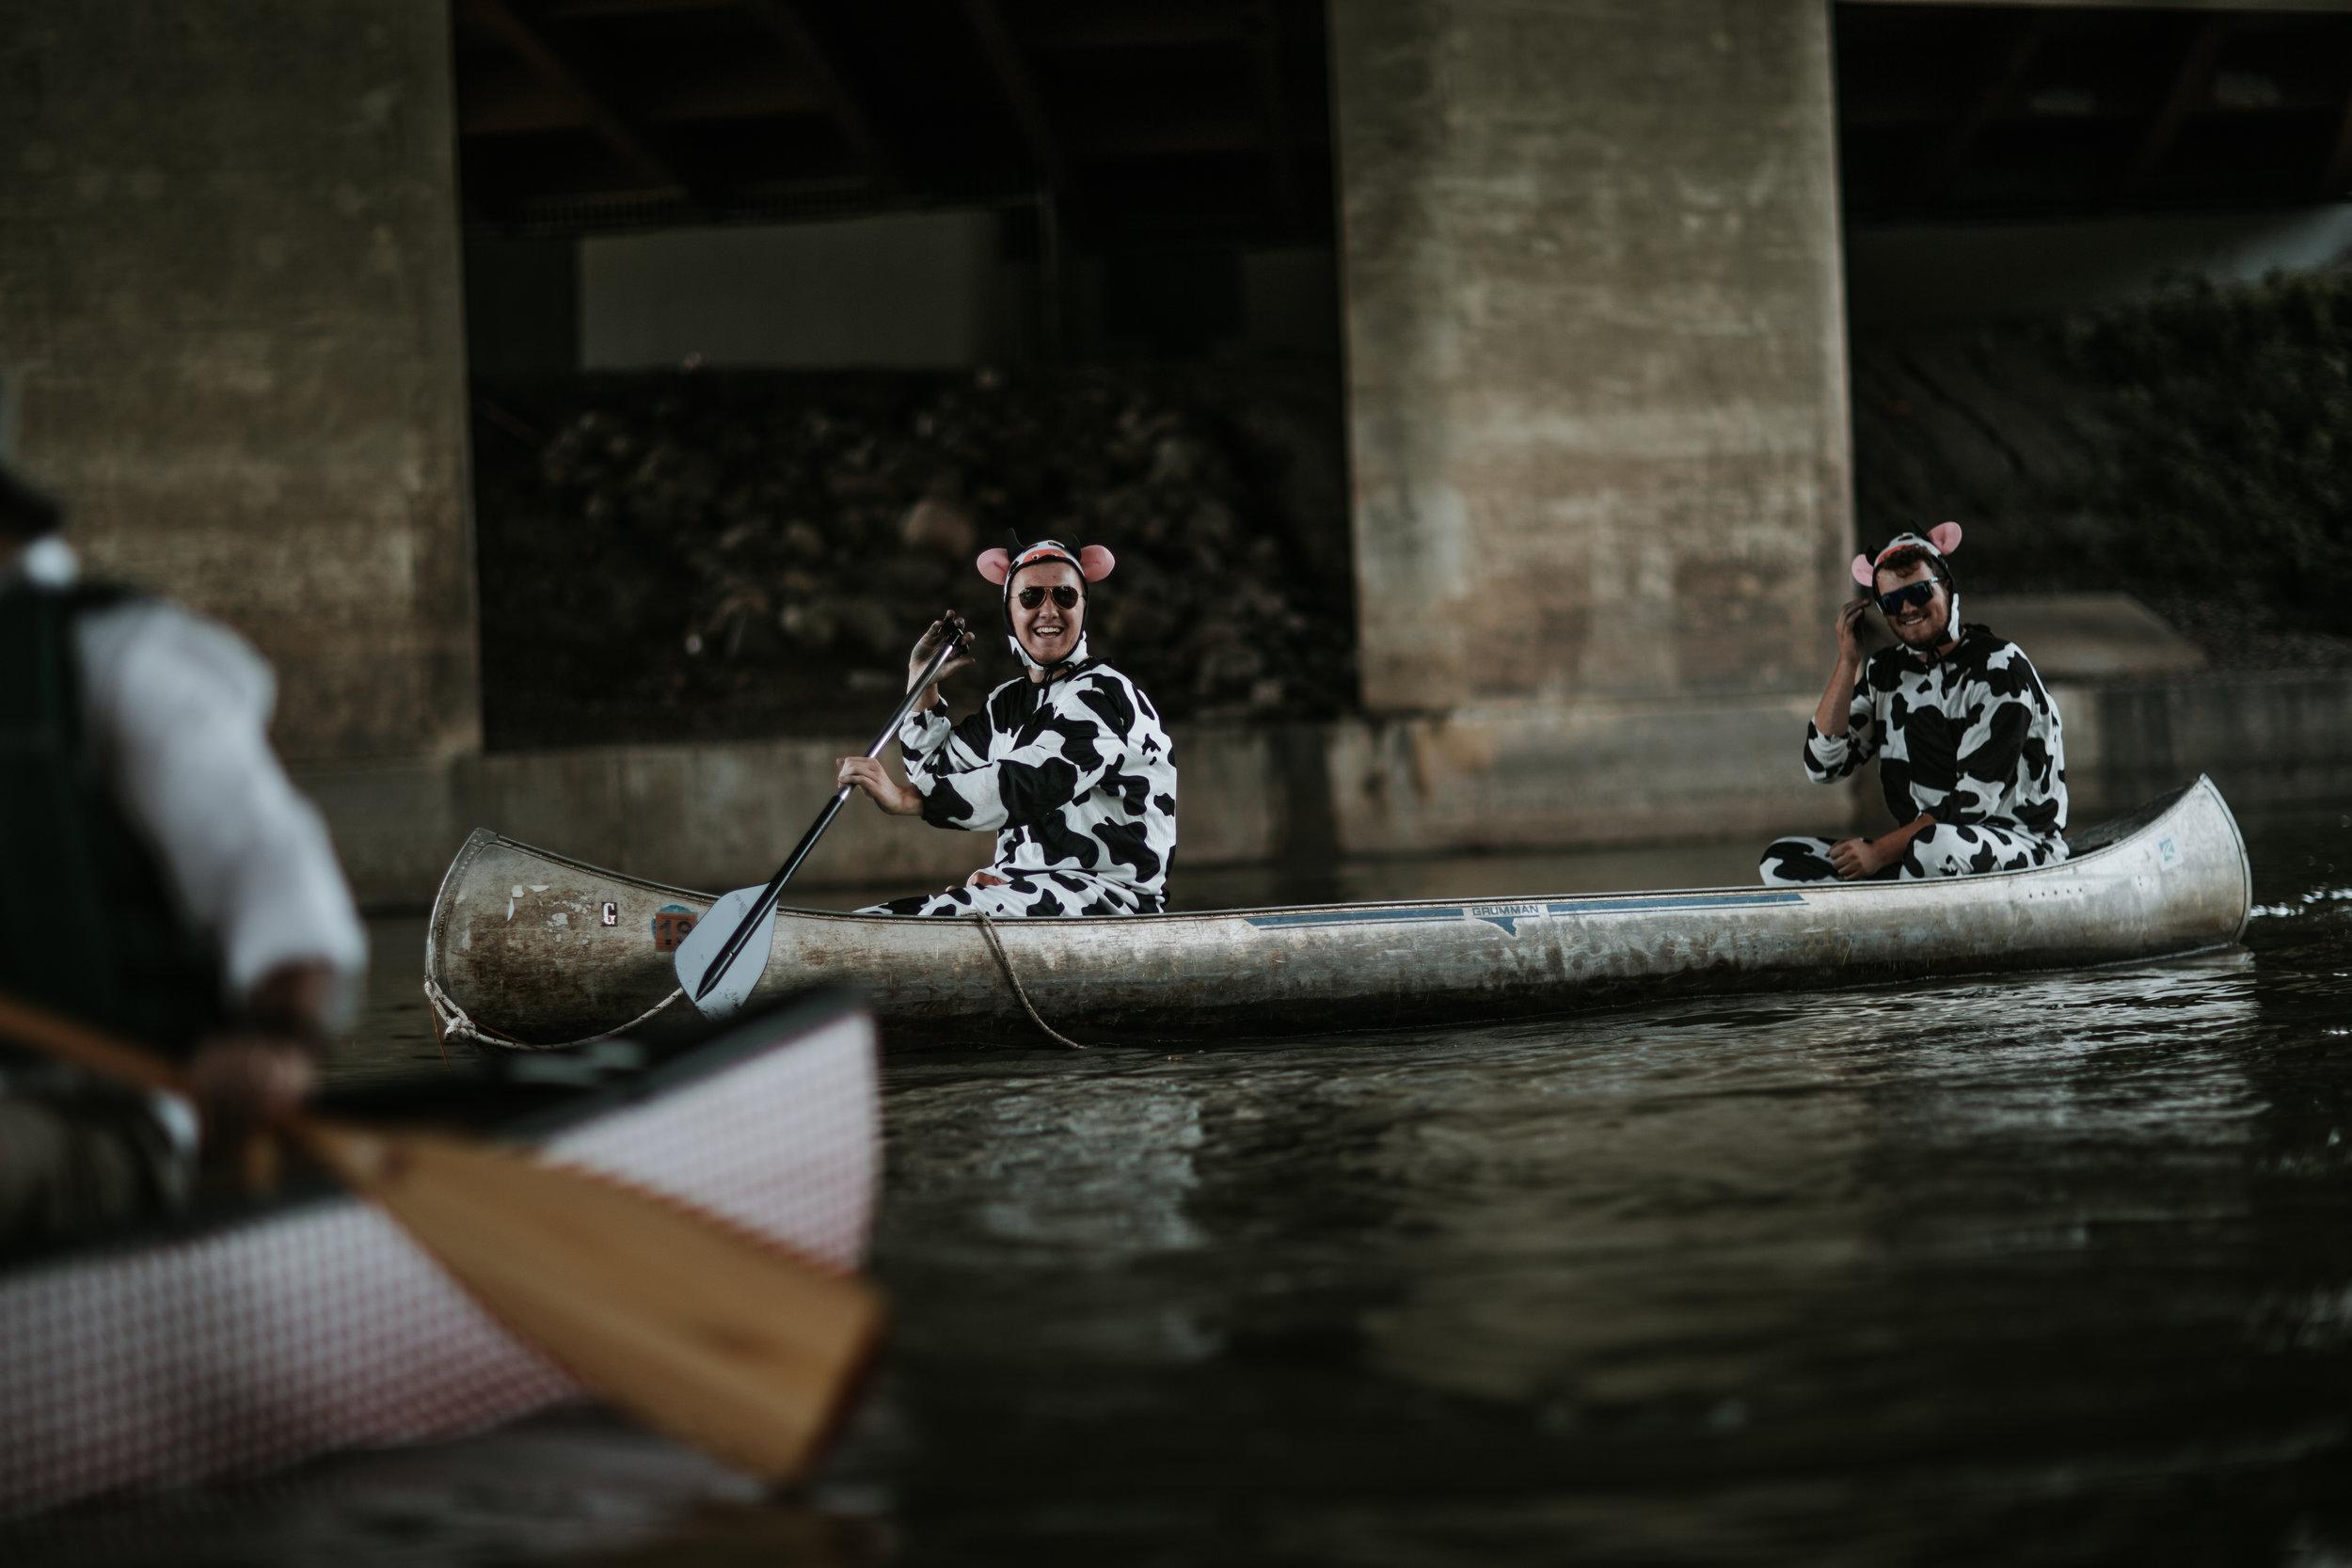 canoeparade-6409.jpg